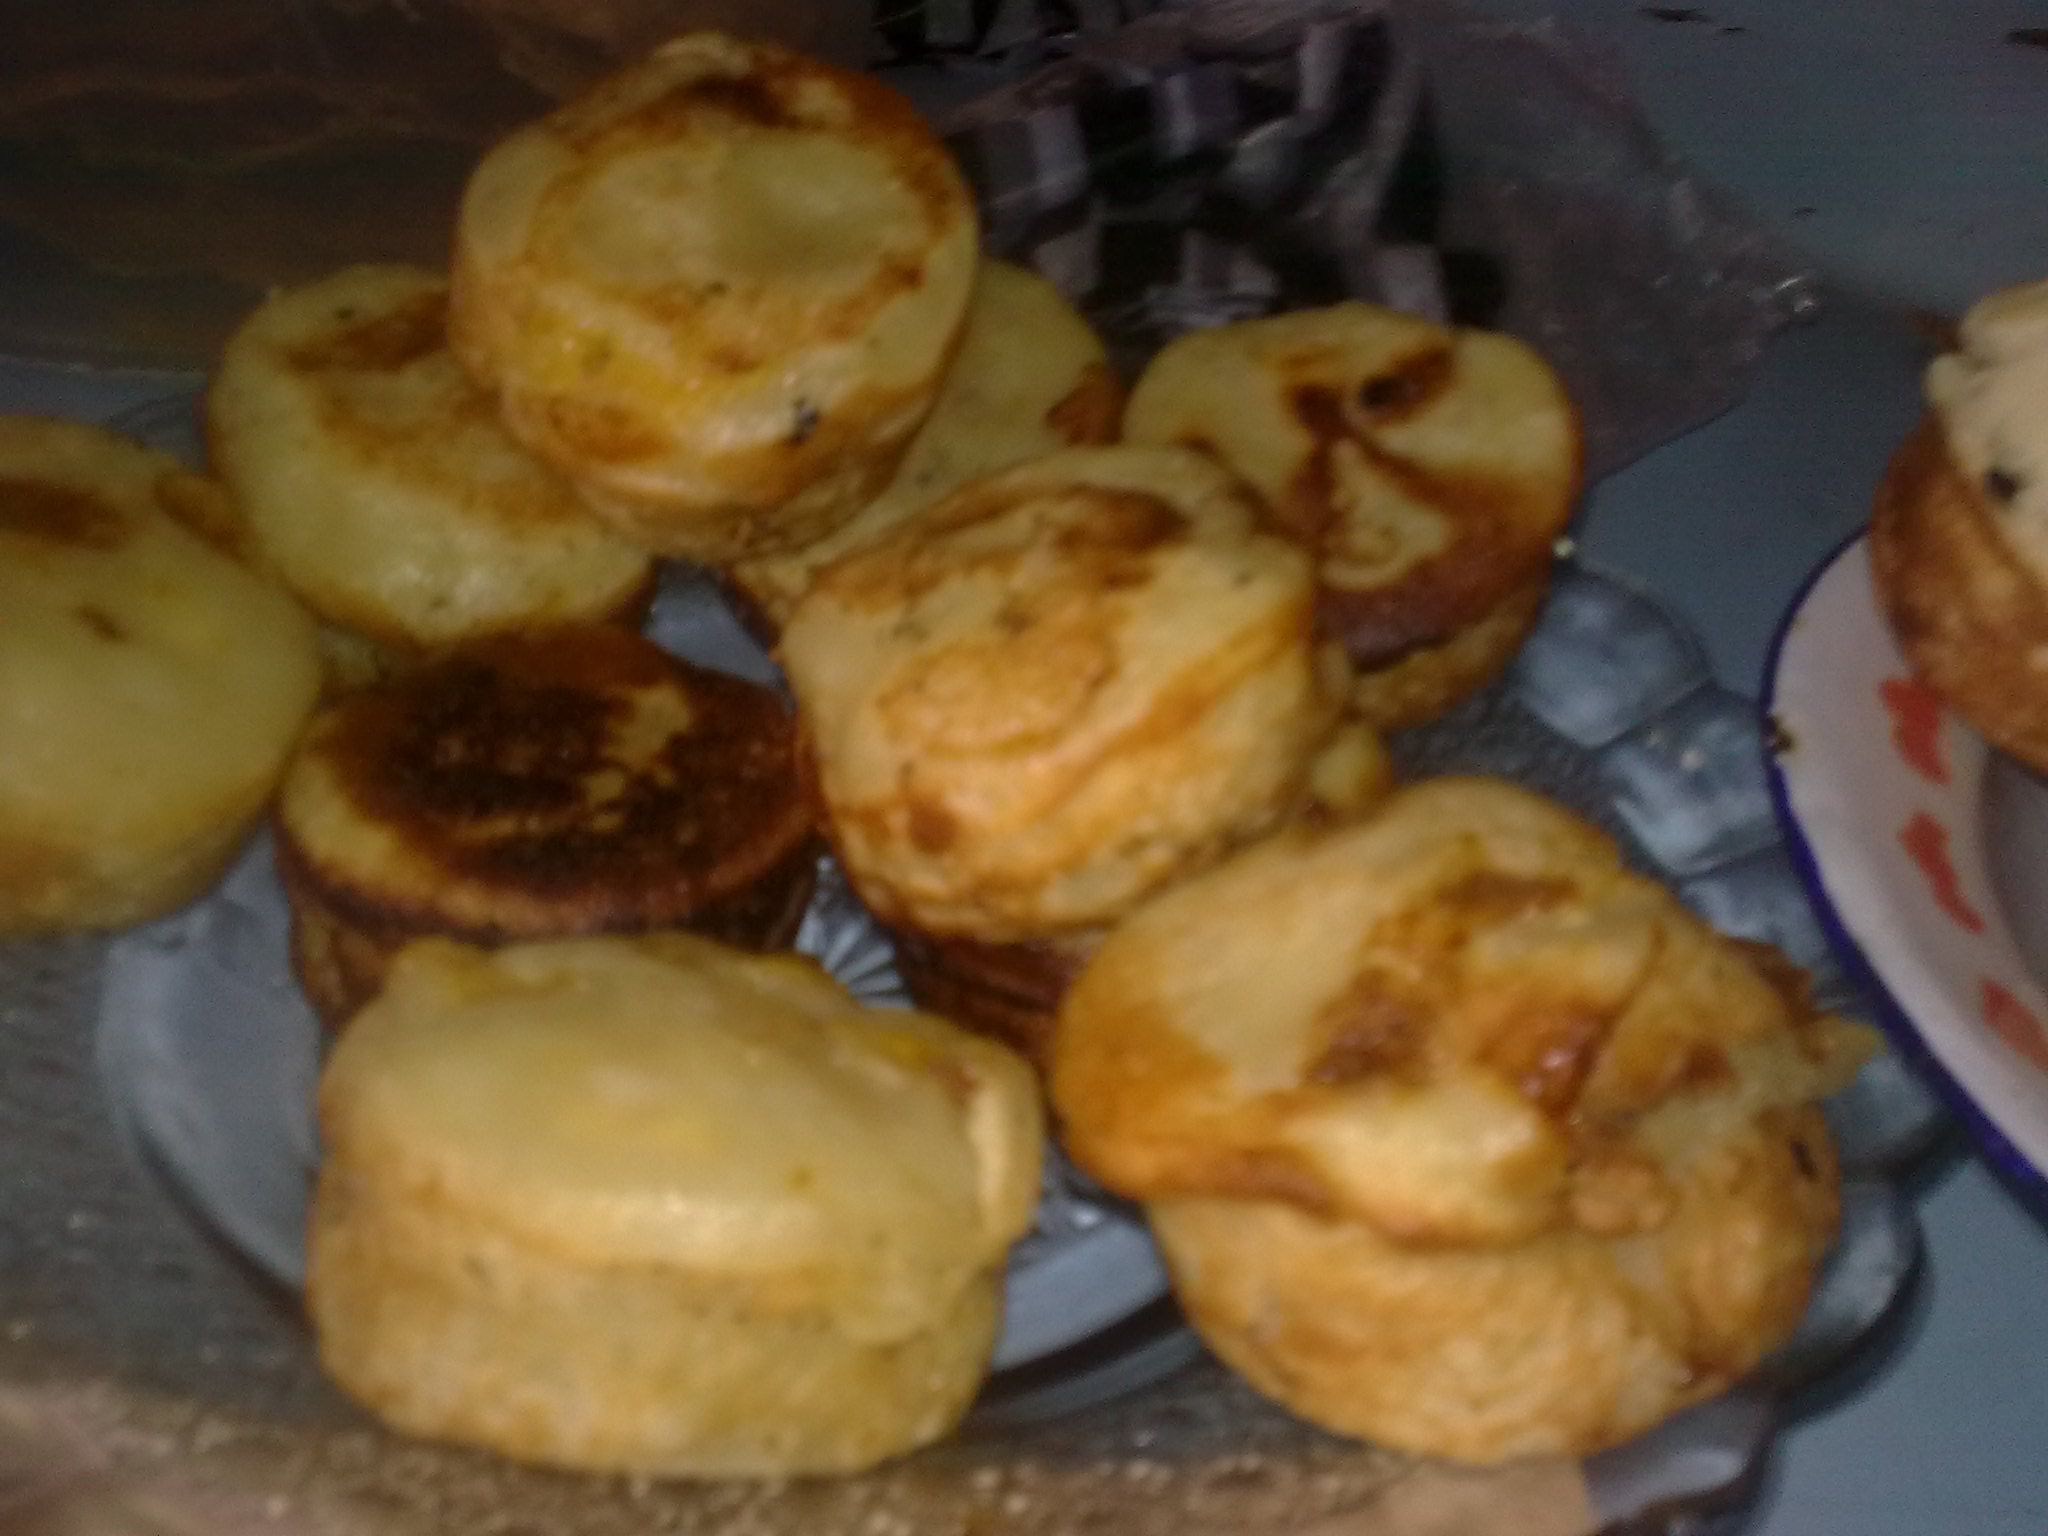 Kue Khas Banjarmasin Kalimantan Selatan Makanan Kue Masakan